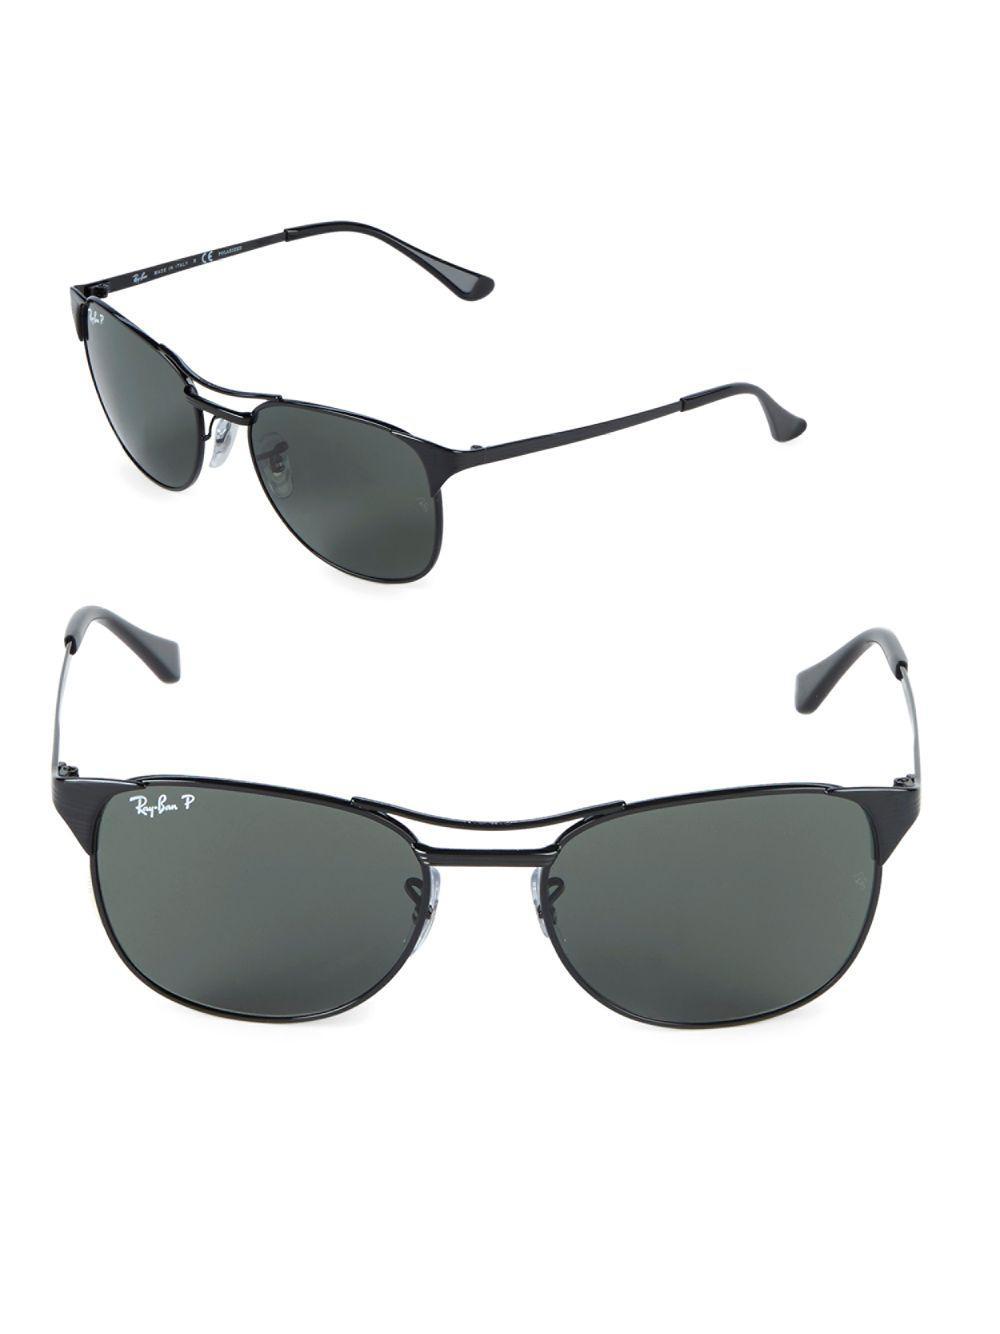 456b5bb1e5 ... top quality ray ban. mens black 55mm polarized signet sunglasses eaca2  47f3e